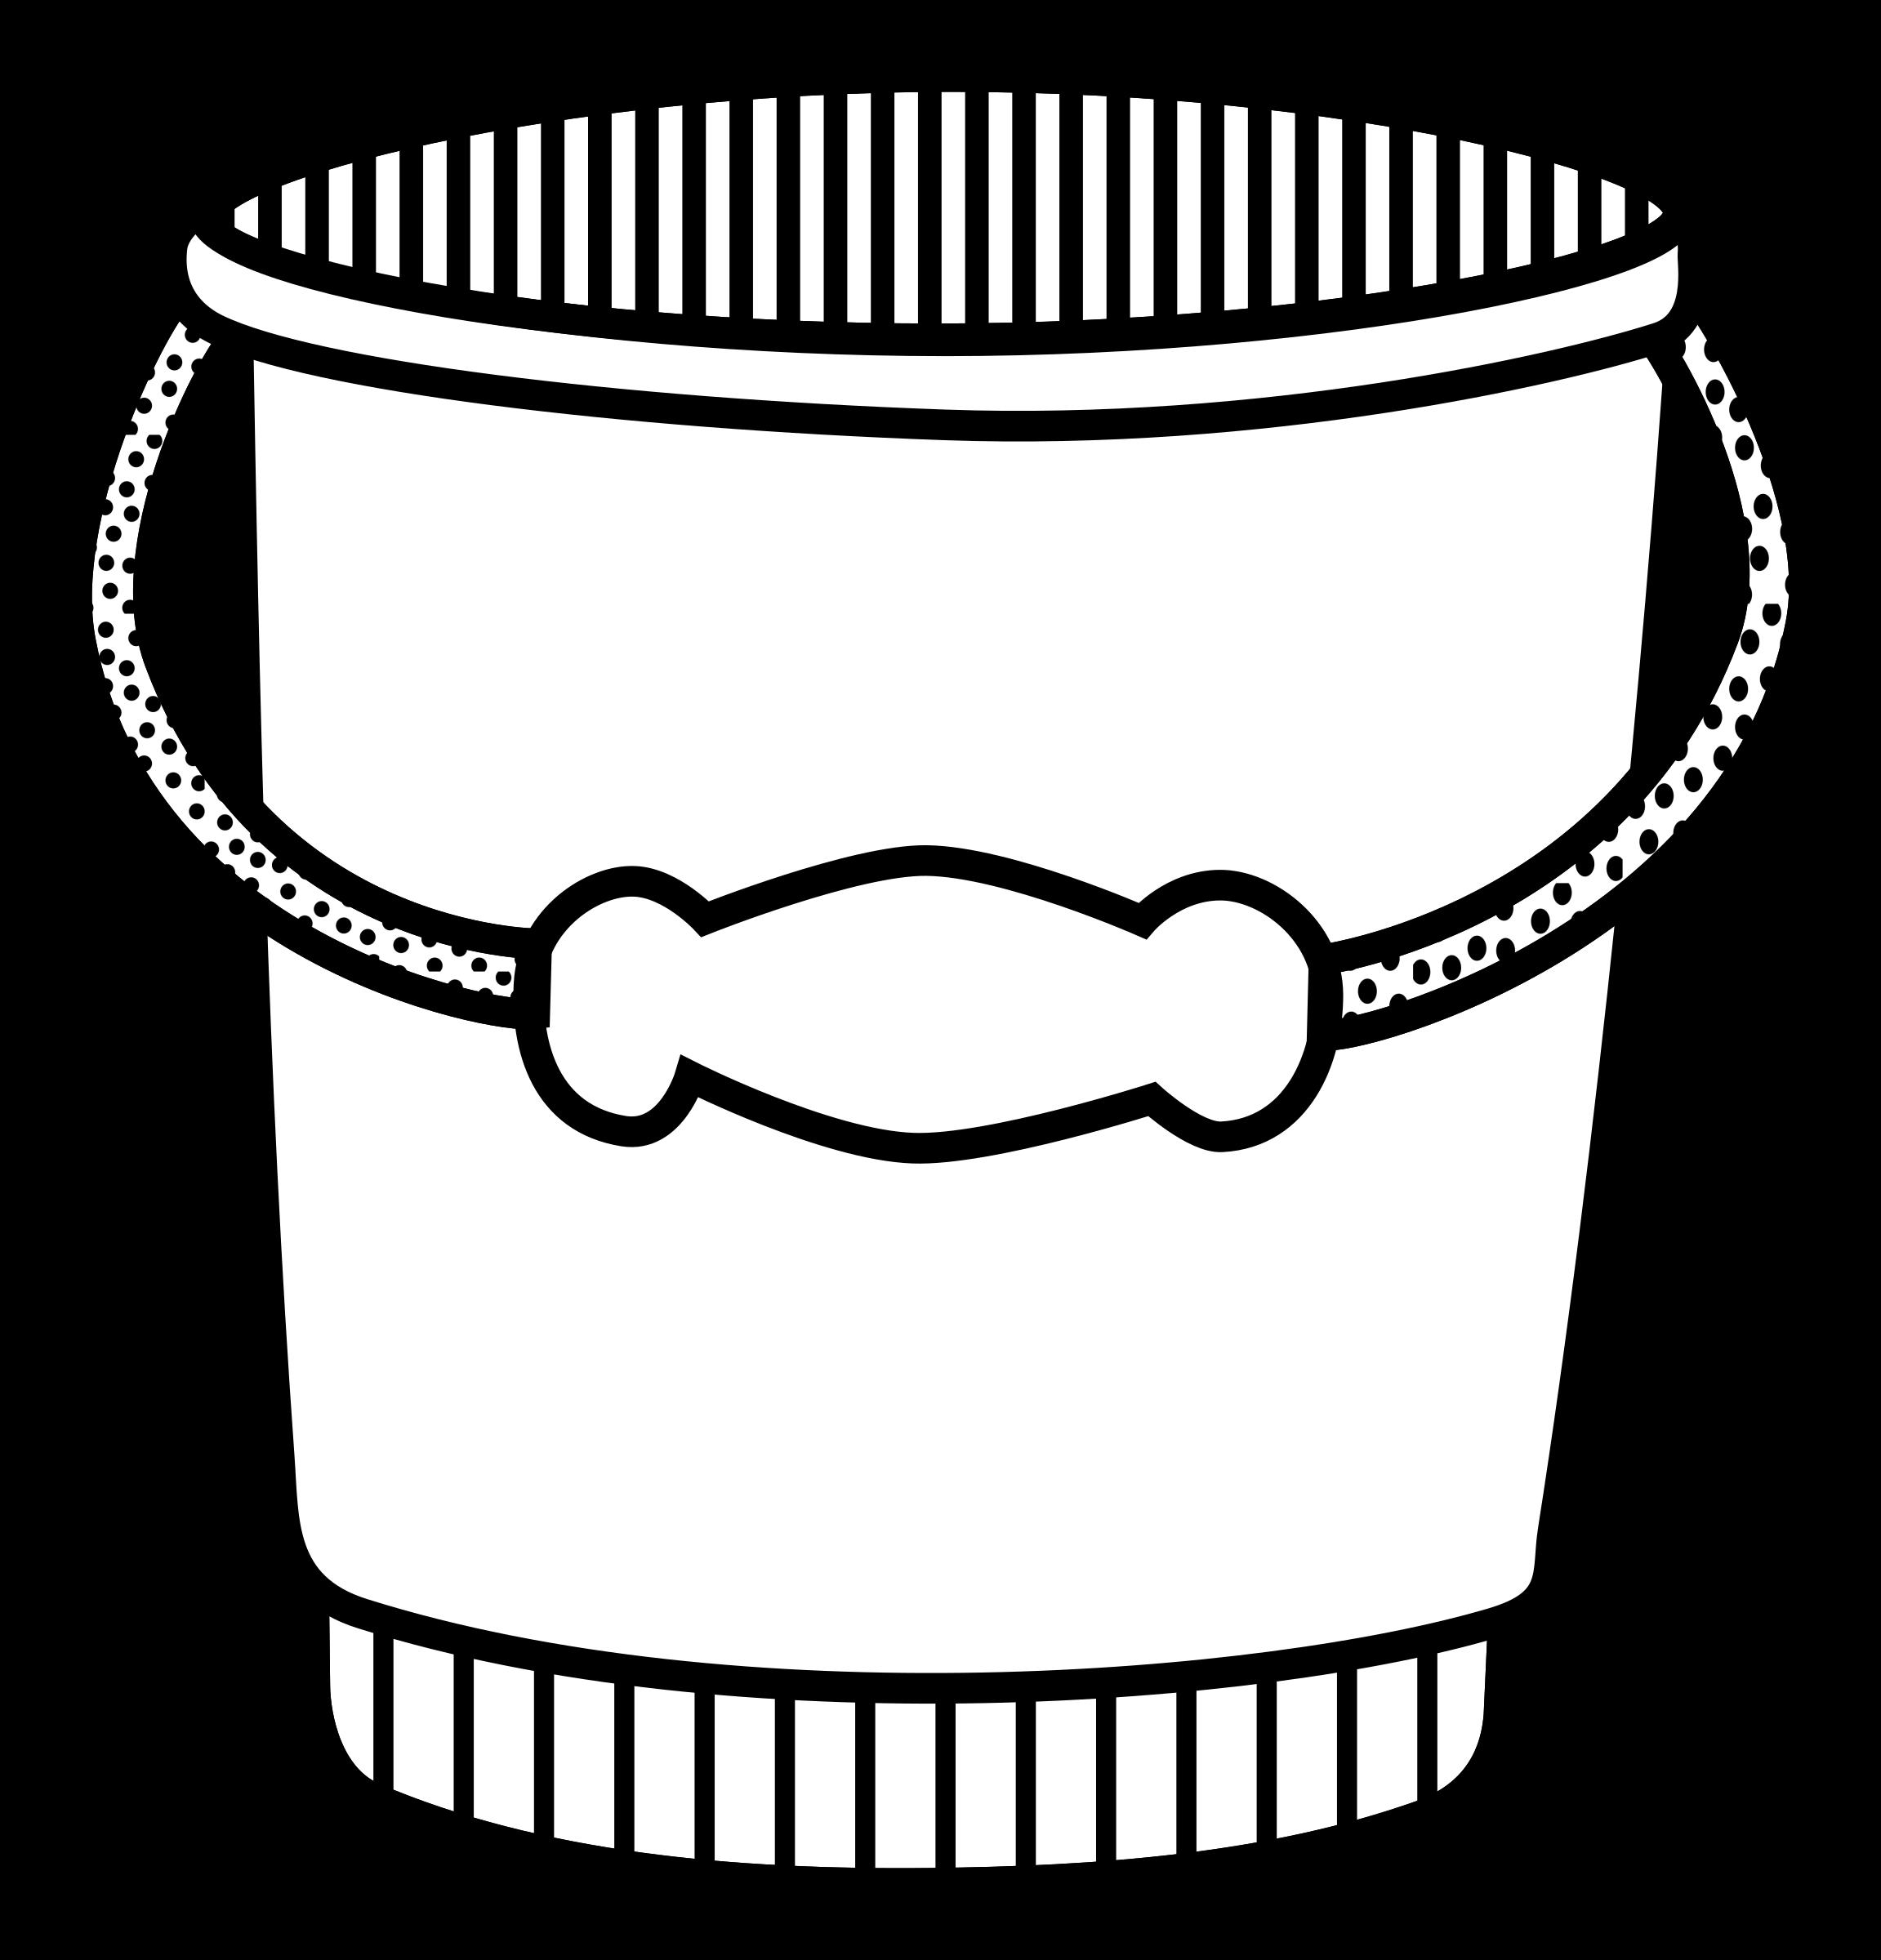 Bucket clipart bucket outline. Lineart big image png